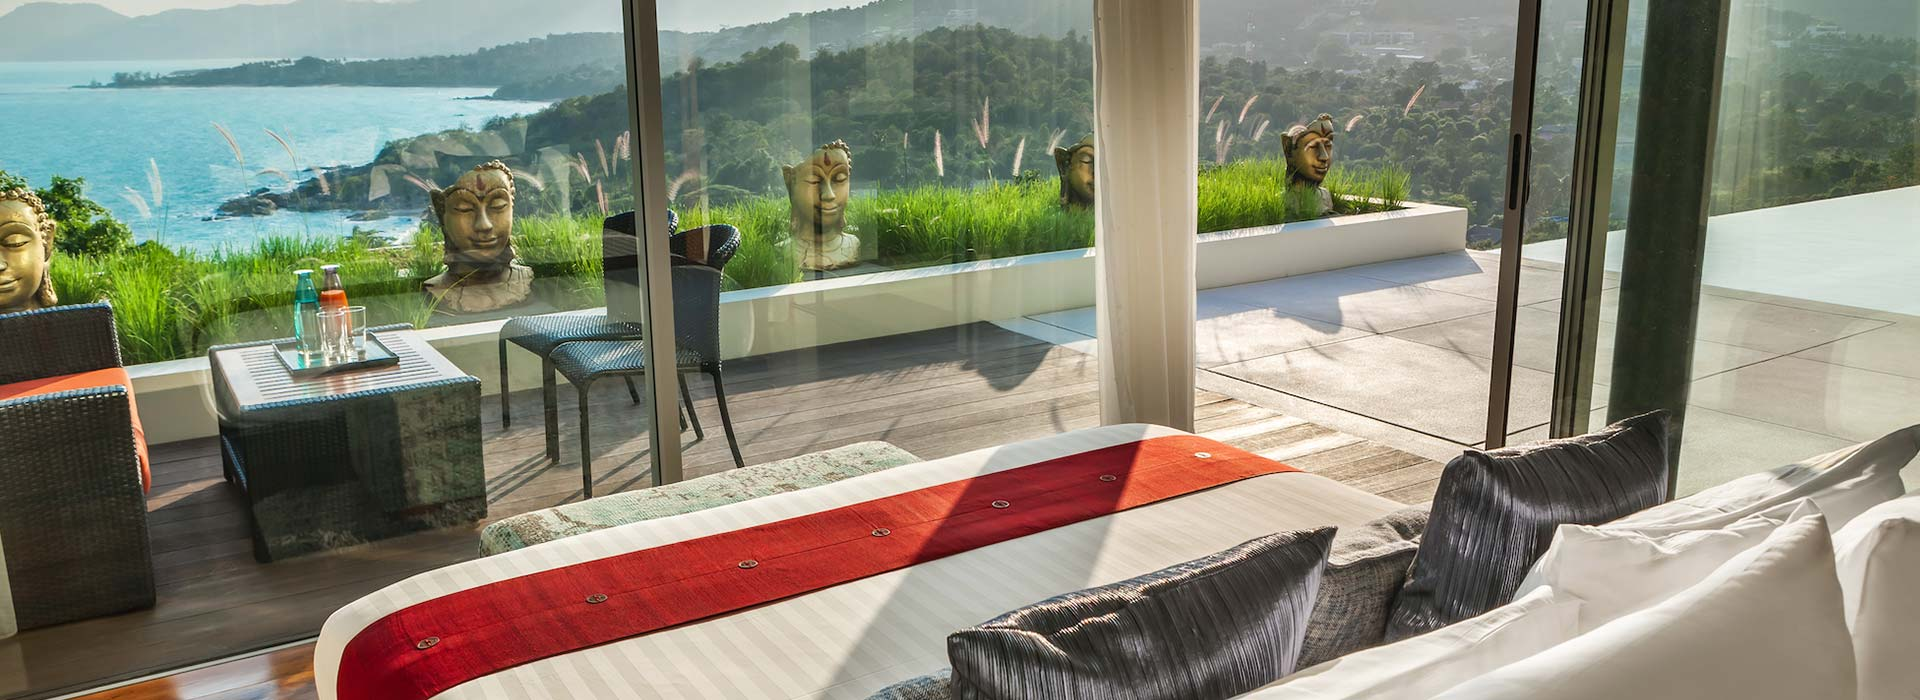 Villa Sangkachai<br>with private pool